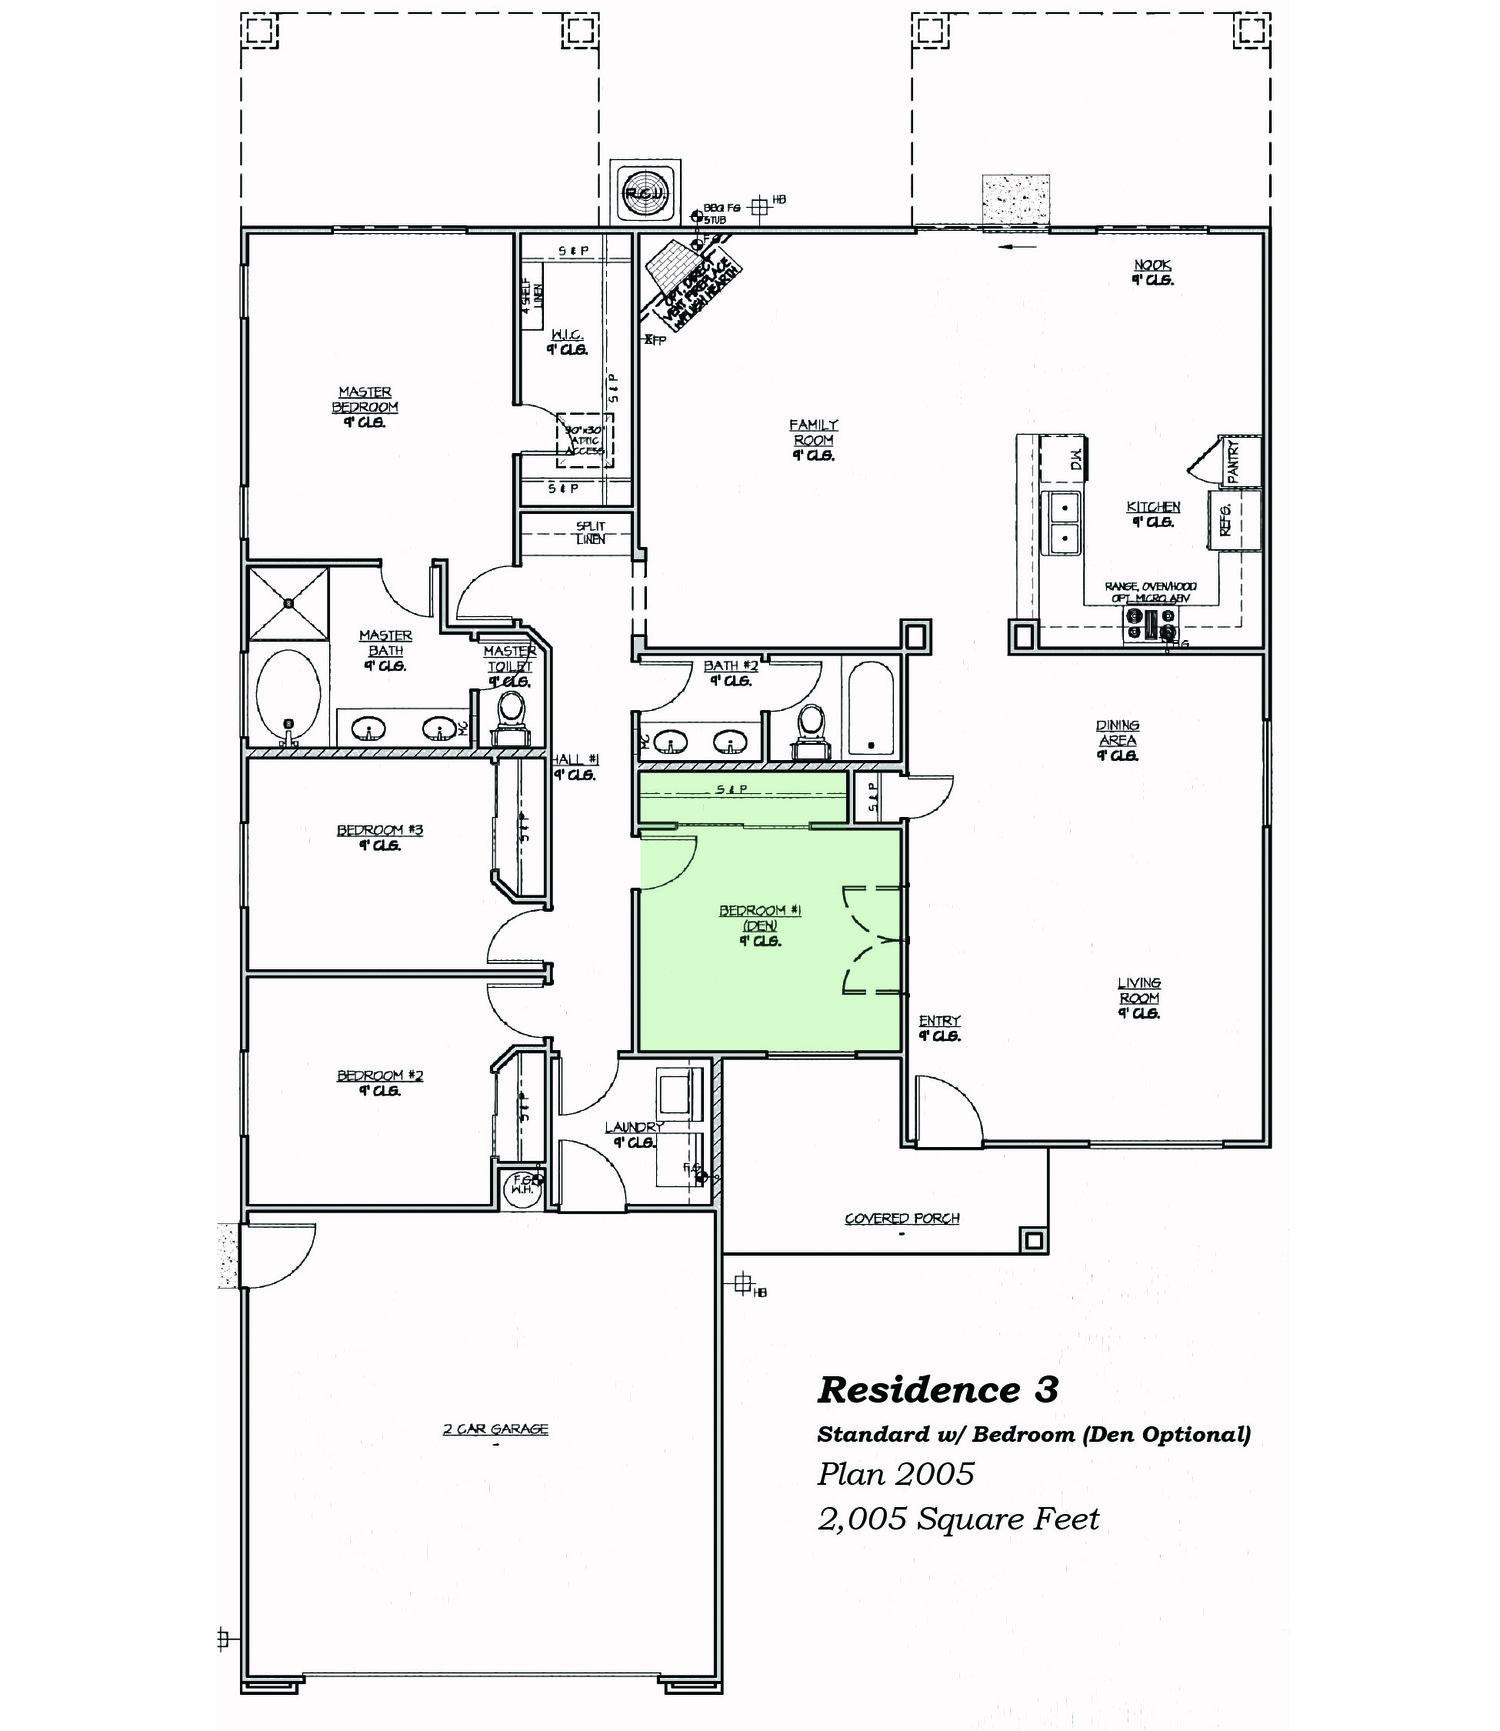 SKy Haven Residence 3 Floorplan .jpeg